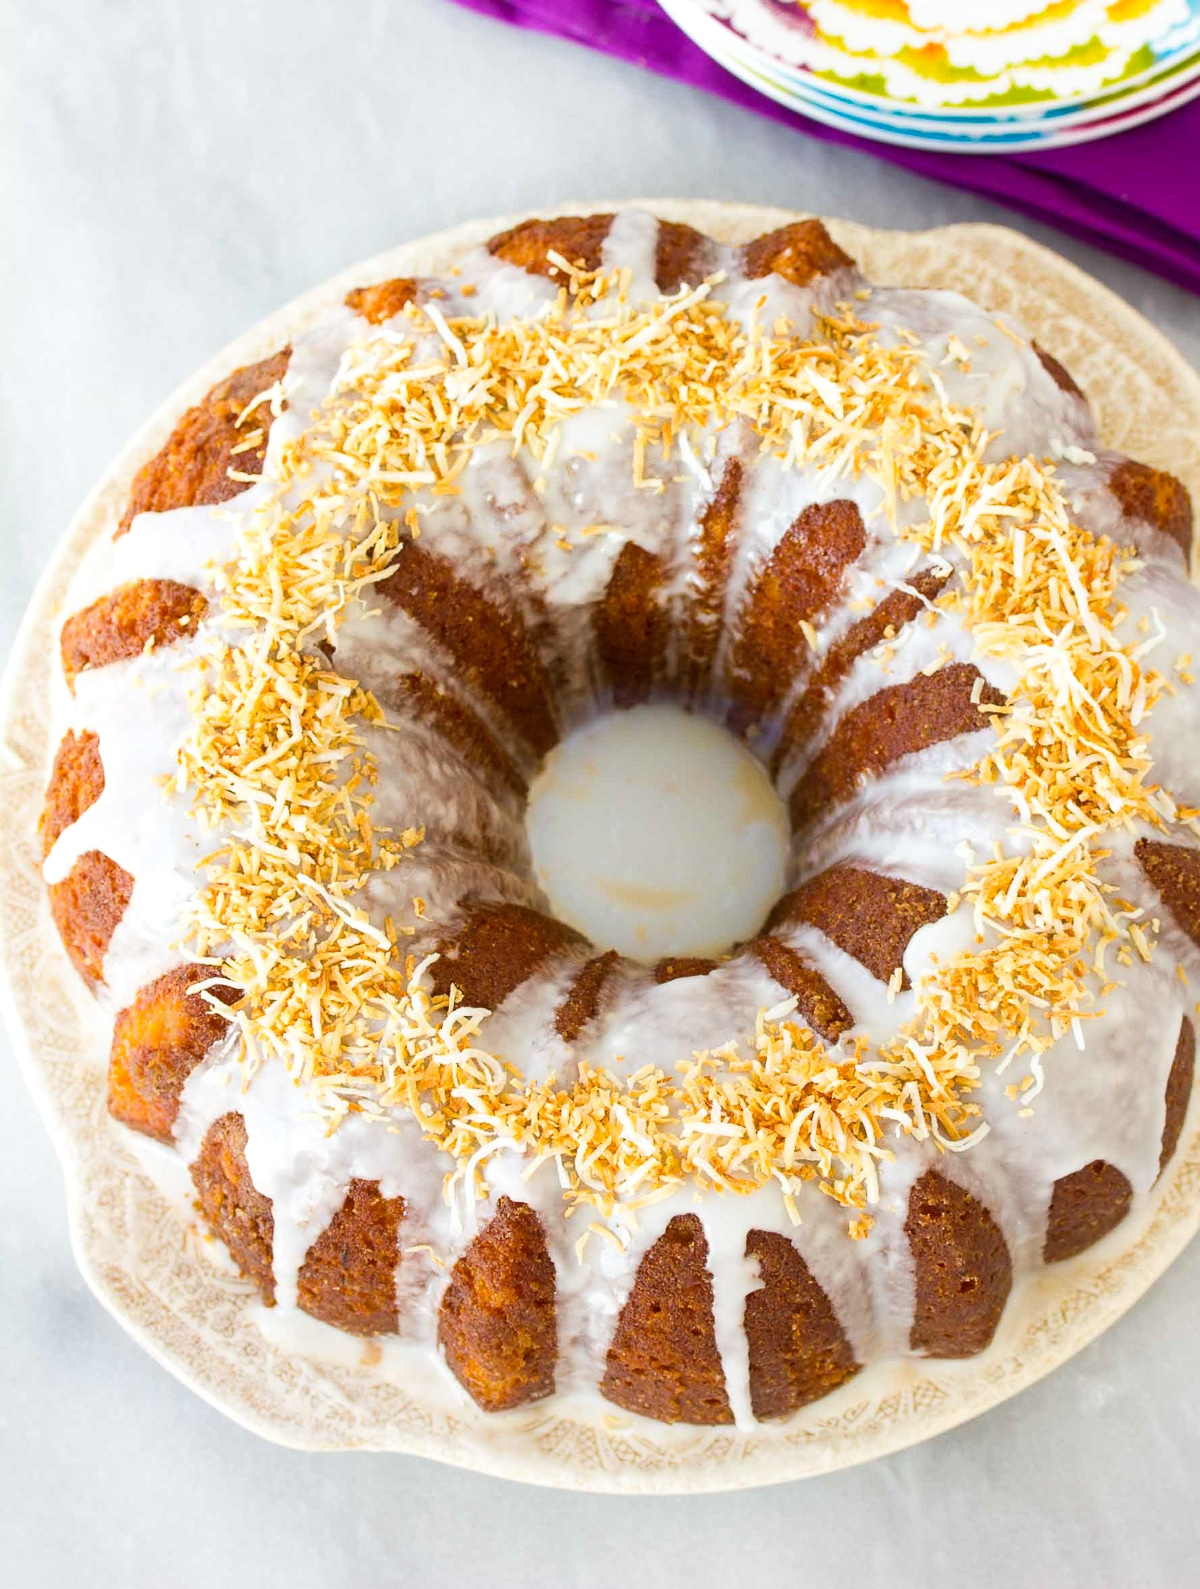 Best Rum Cake Recipe #ASpicyPerspective #bundtcake #spicecake #rum #rumcake #caribbean #holiday #coconut #pineapple